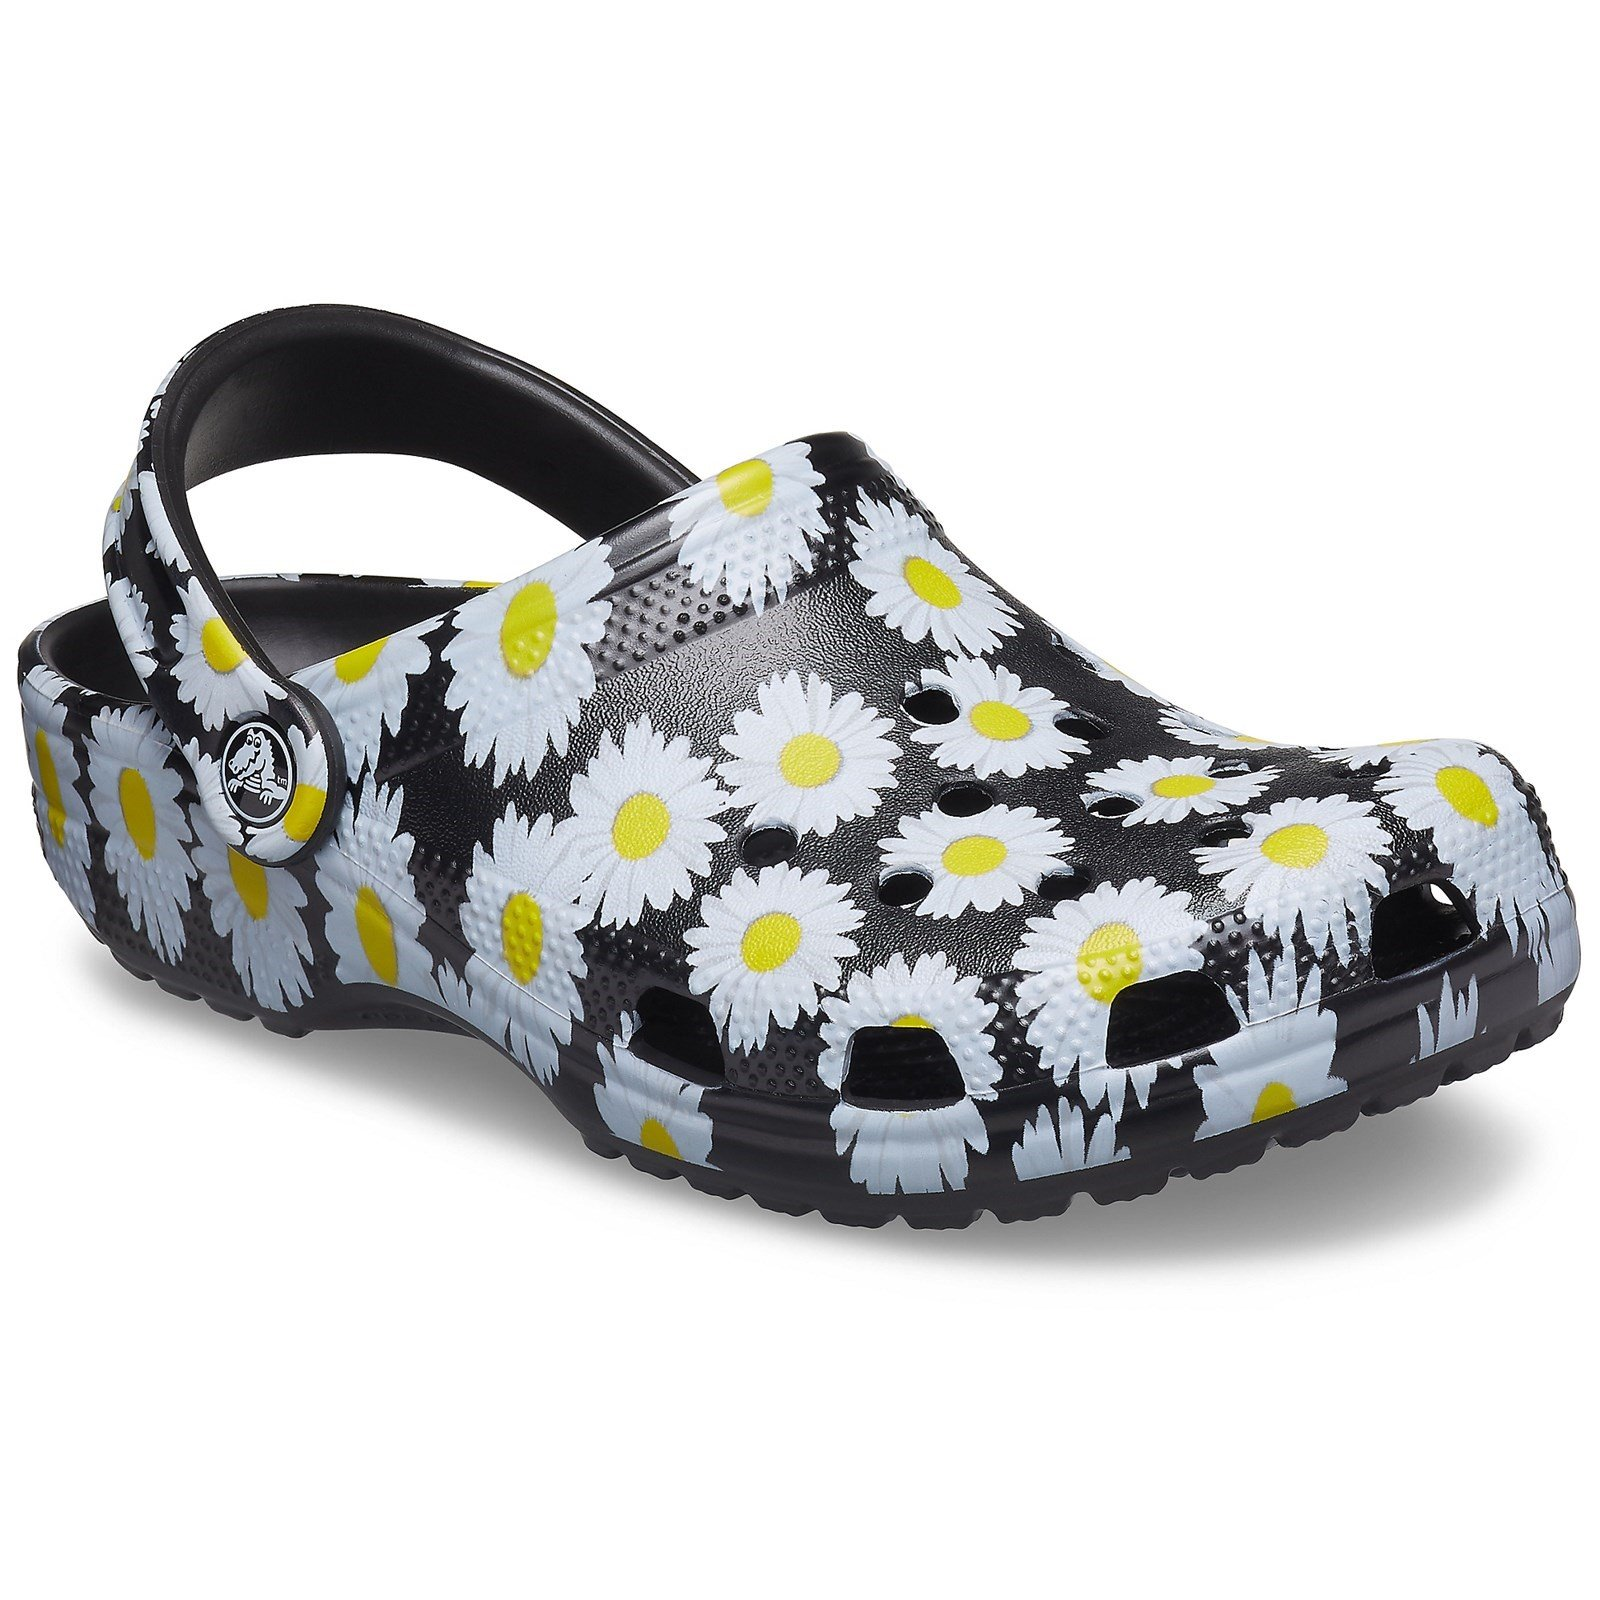 Crocs Unisex Vacay Vibes Clog Shoe Various Colours 31866-55895 - Black Daisy 3